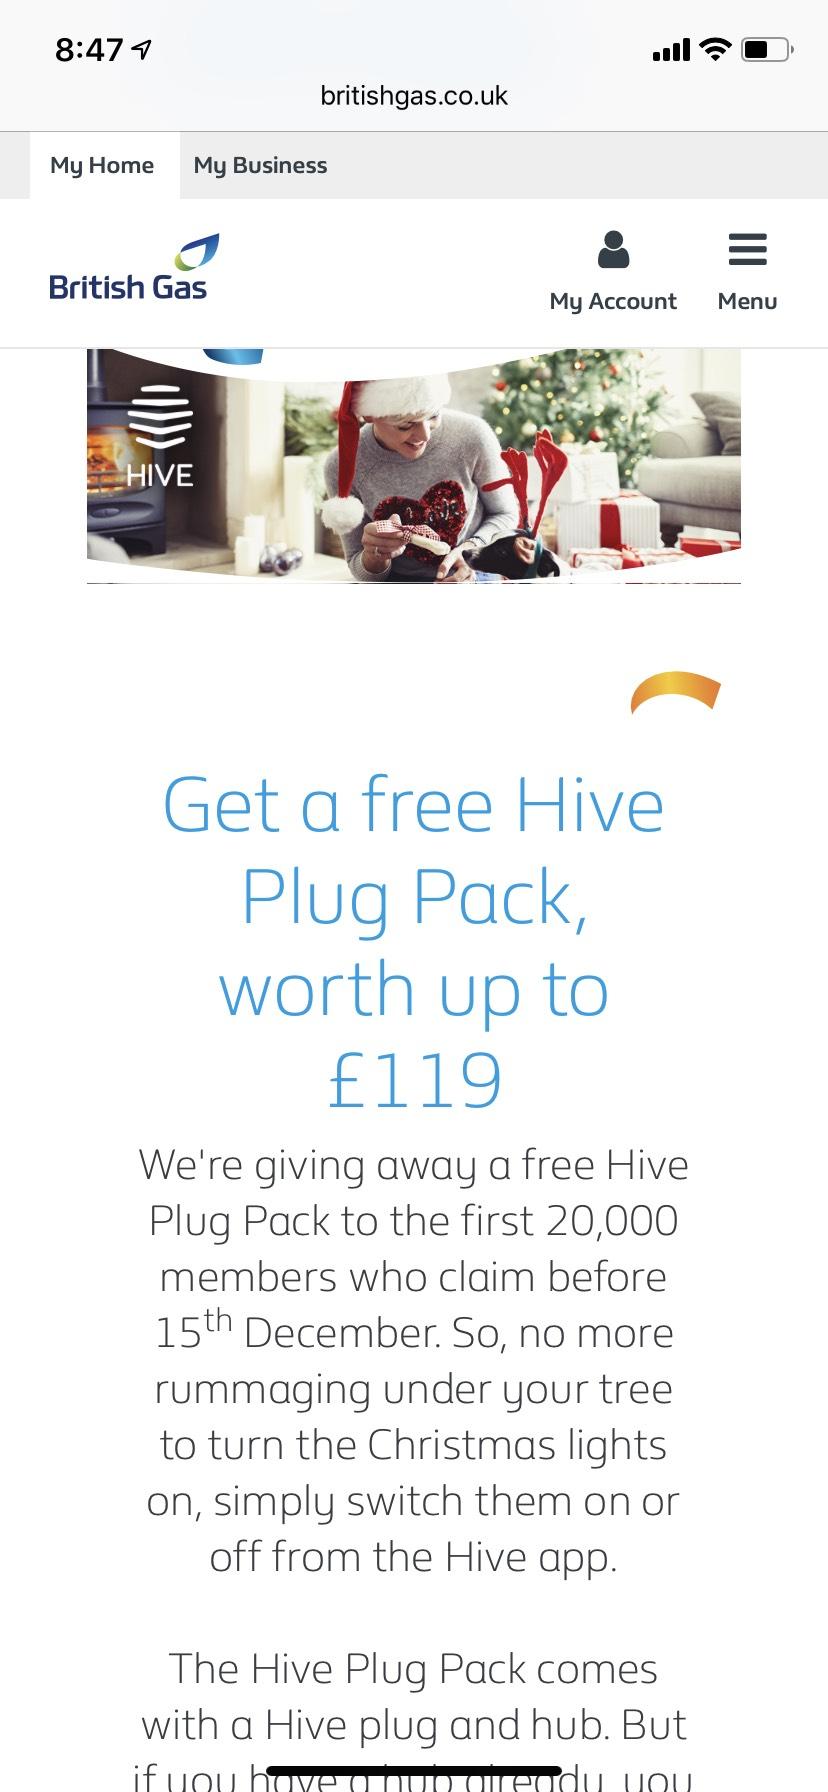 Free Hive plug pack with British Gas rewards